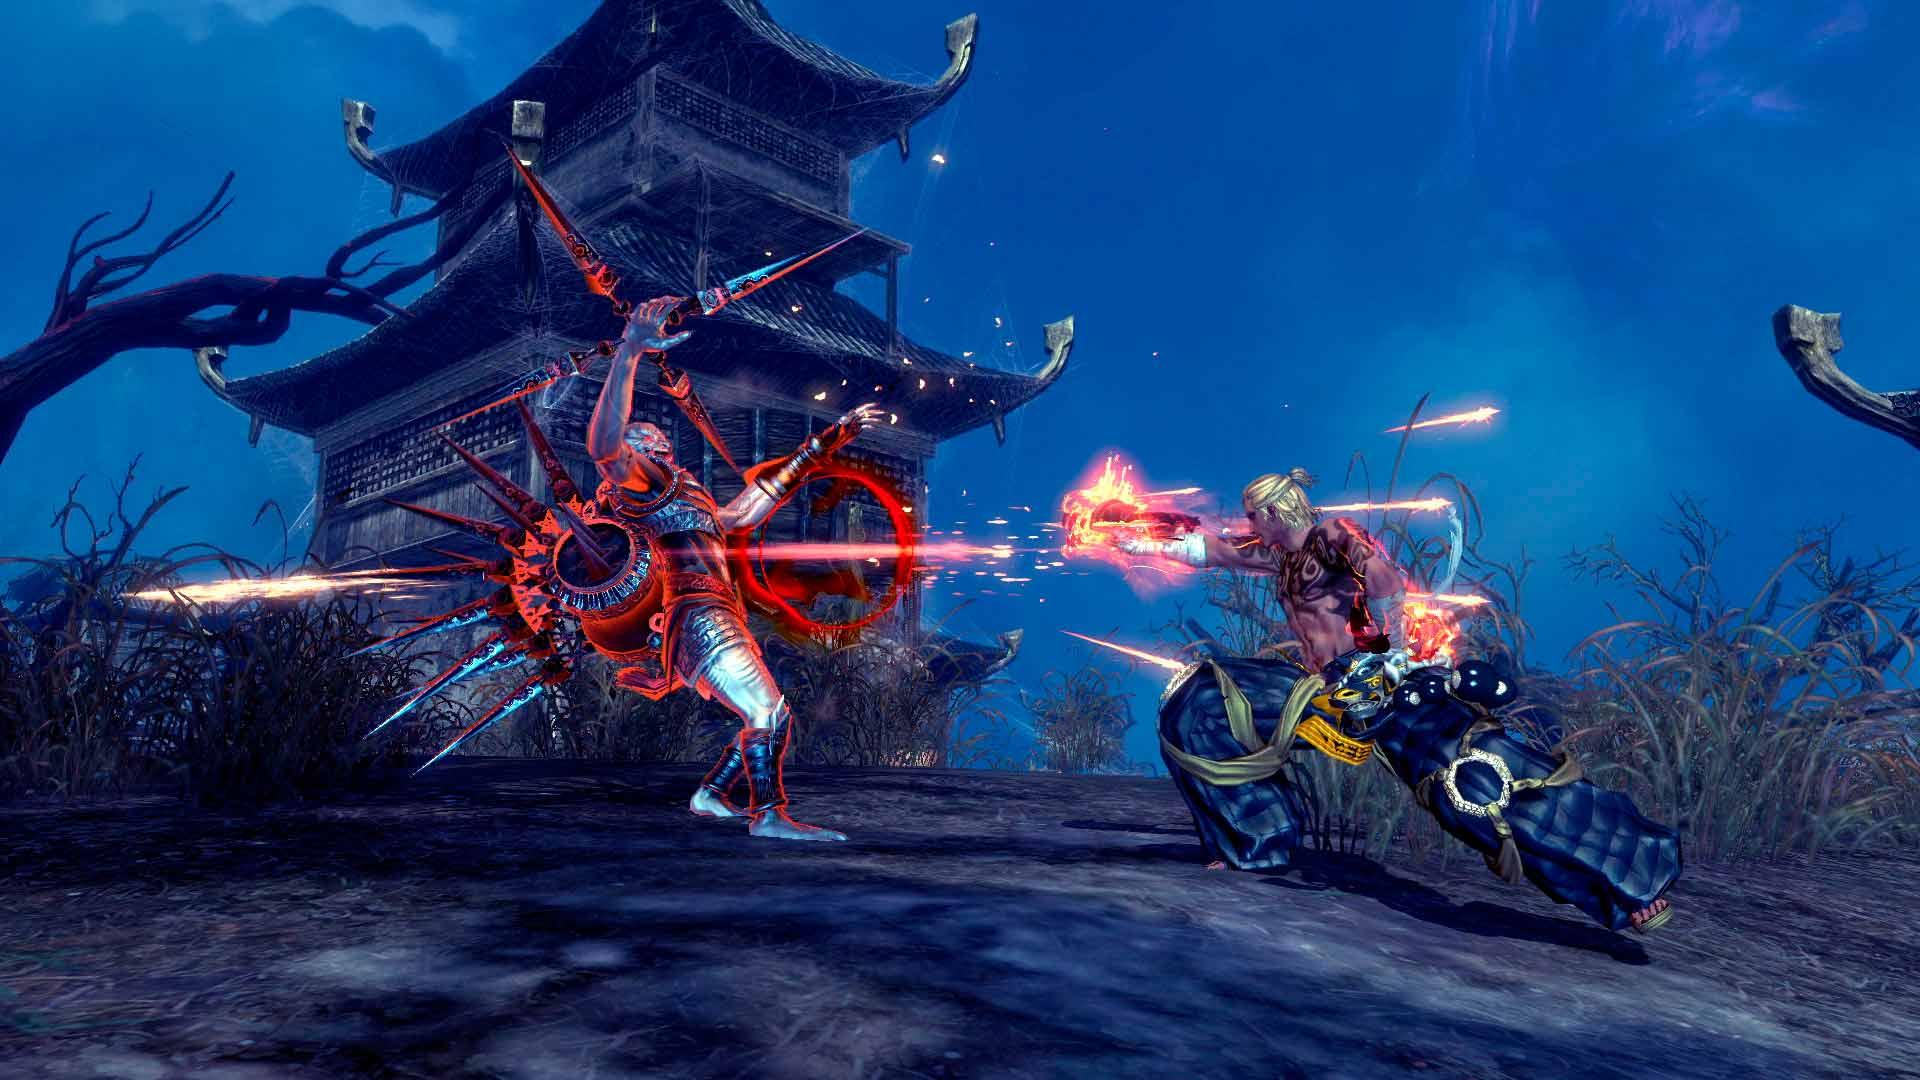 Скриншоты к игре Blade and Soul